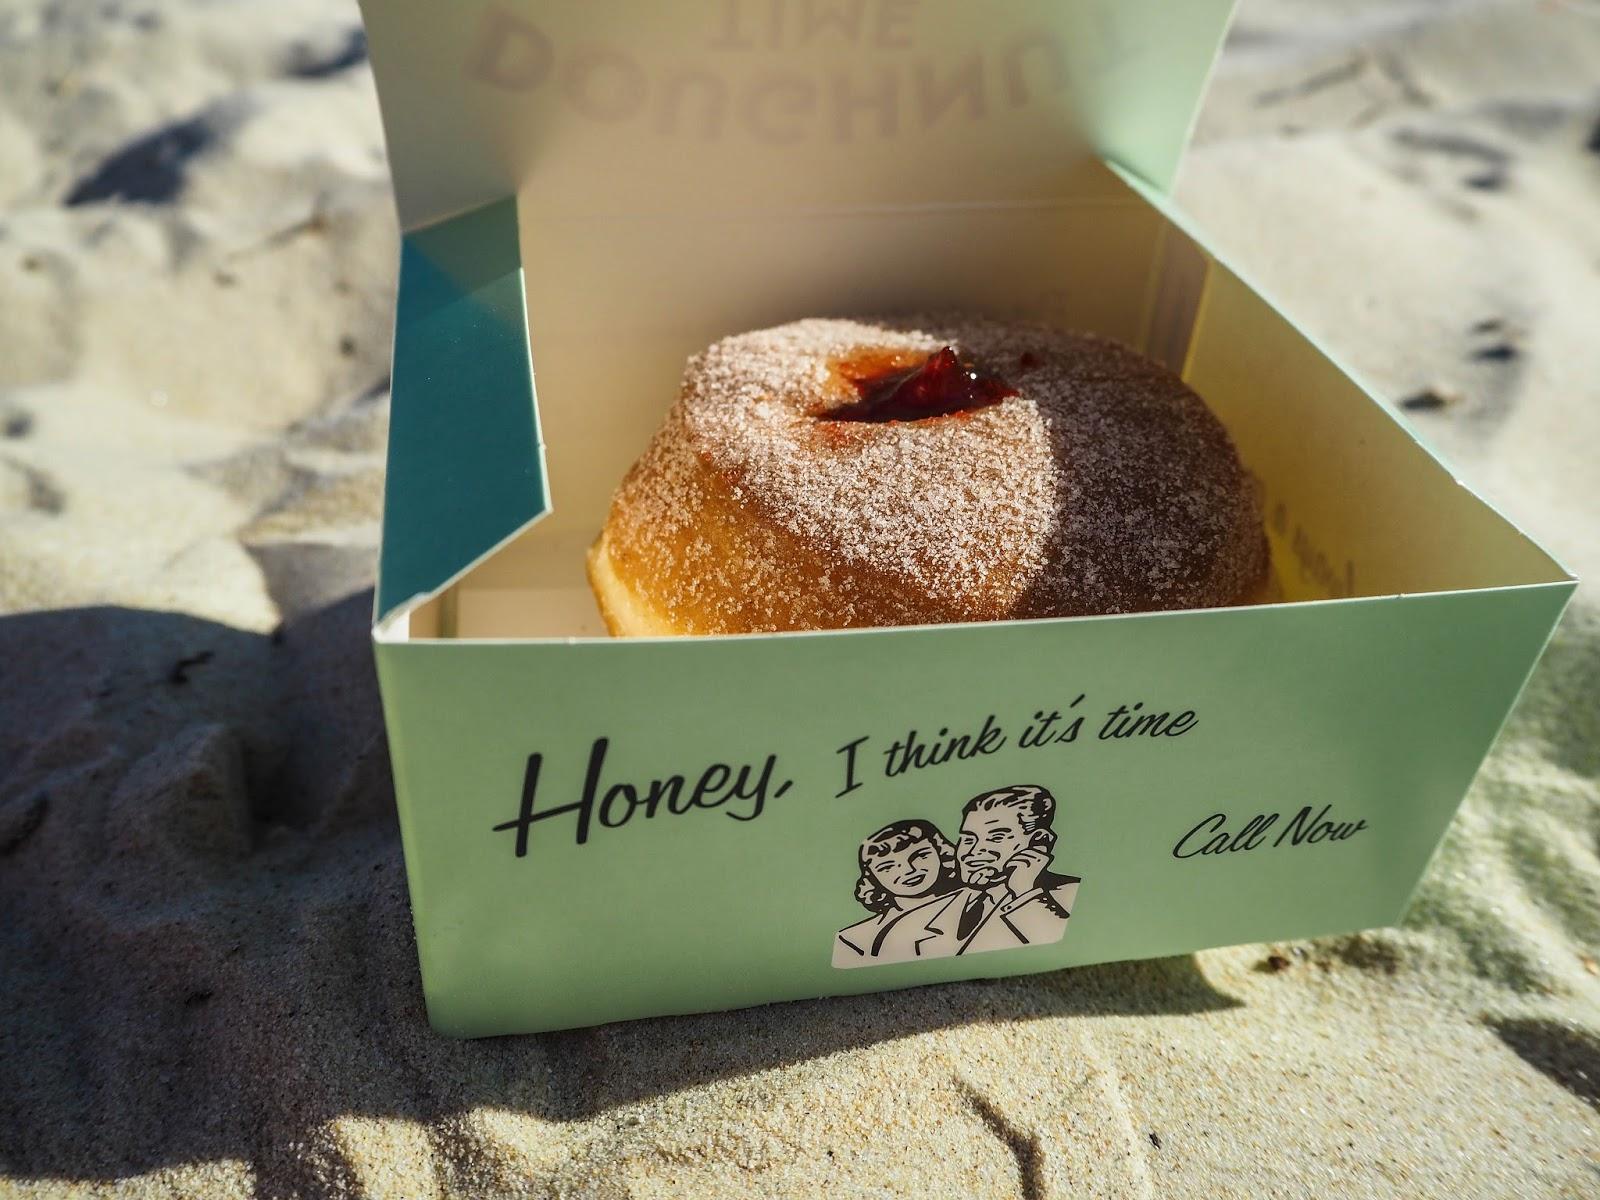 Doughnut Time jam doughnut